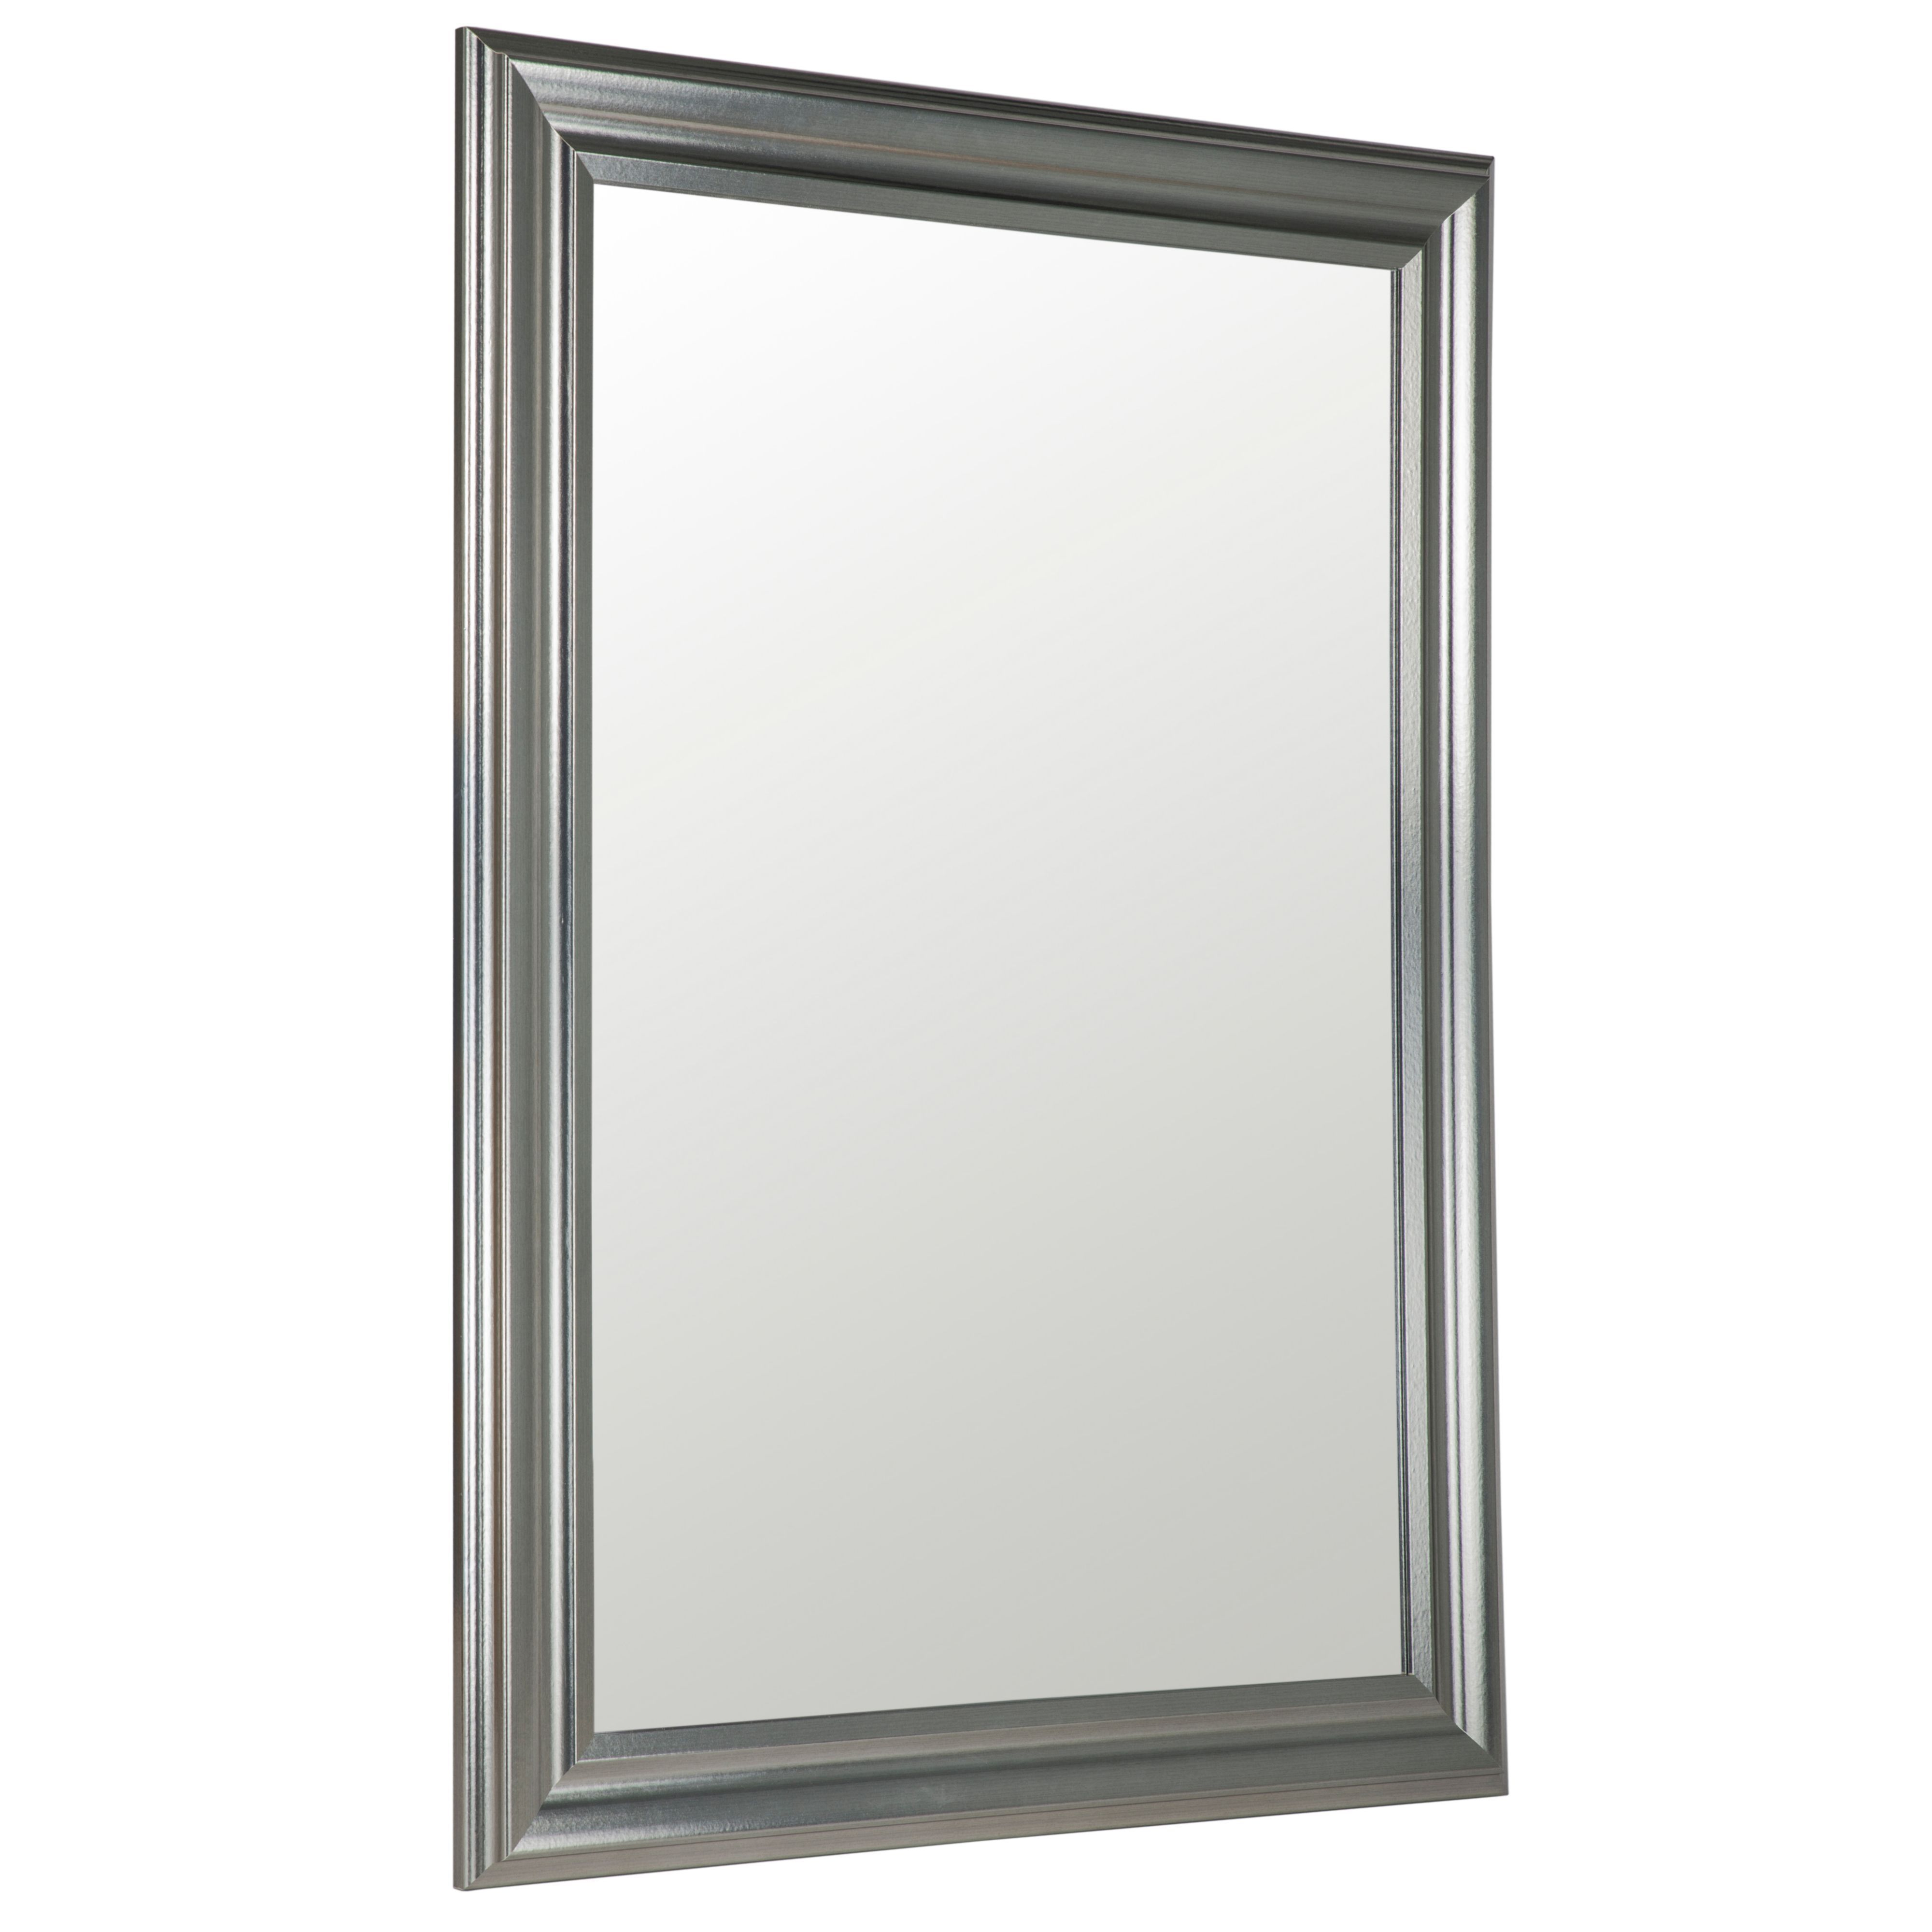 Pewter Effect Framed Rectangular Wall Mirror (h)1060mm (w) 1060mm